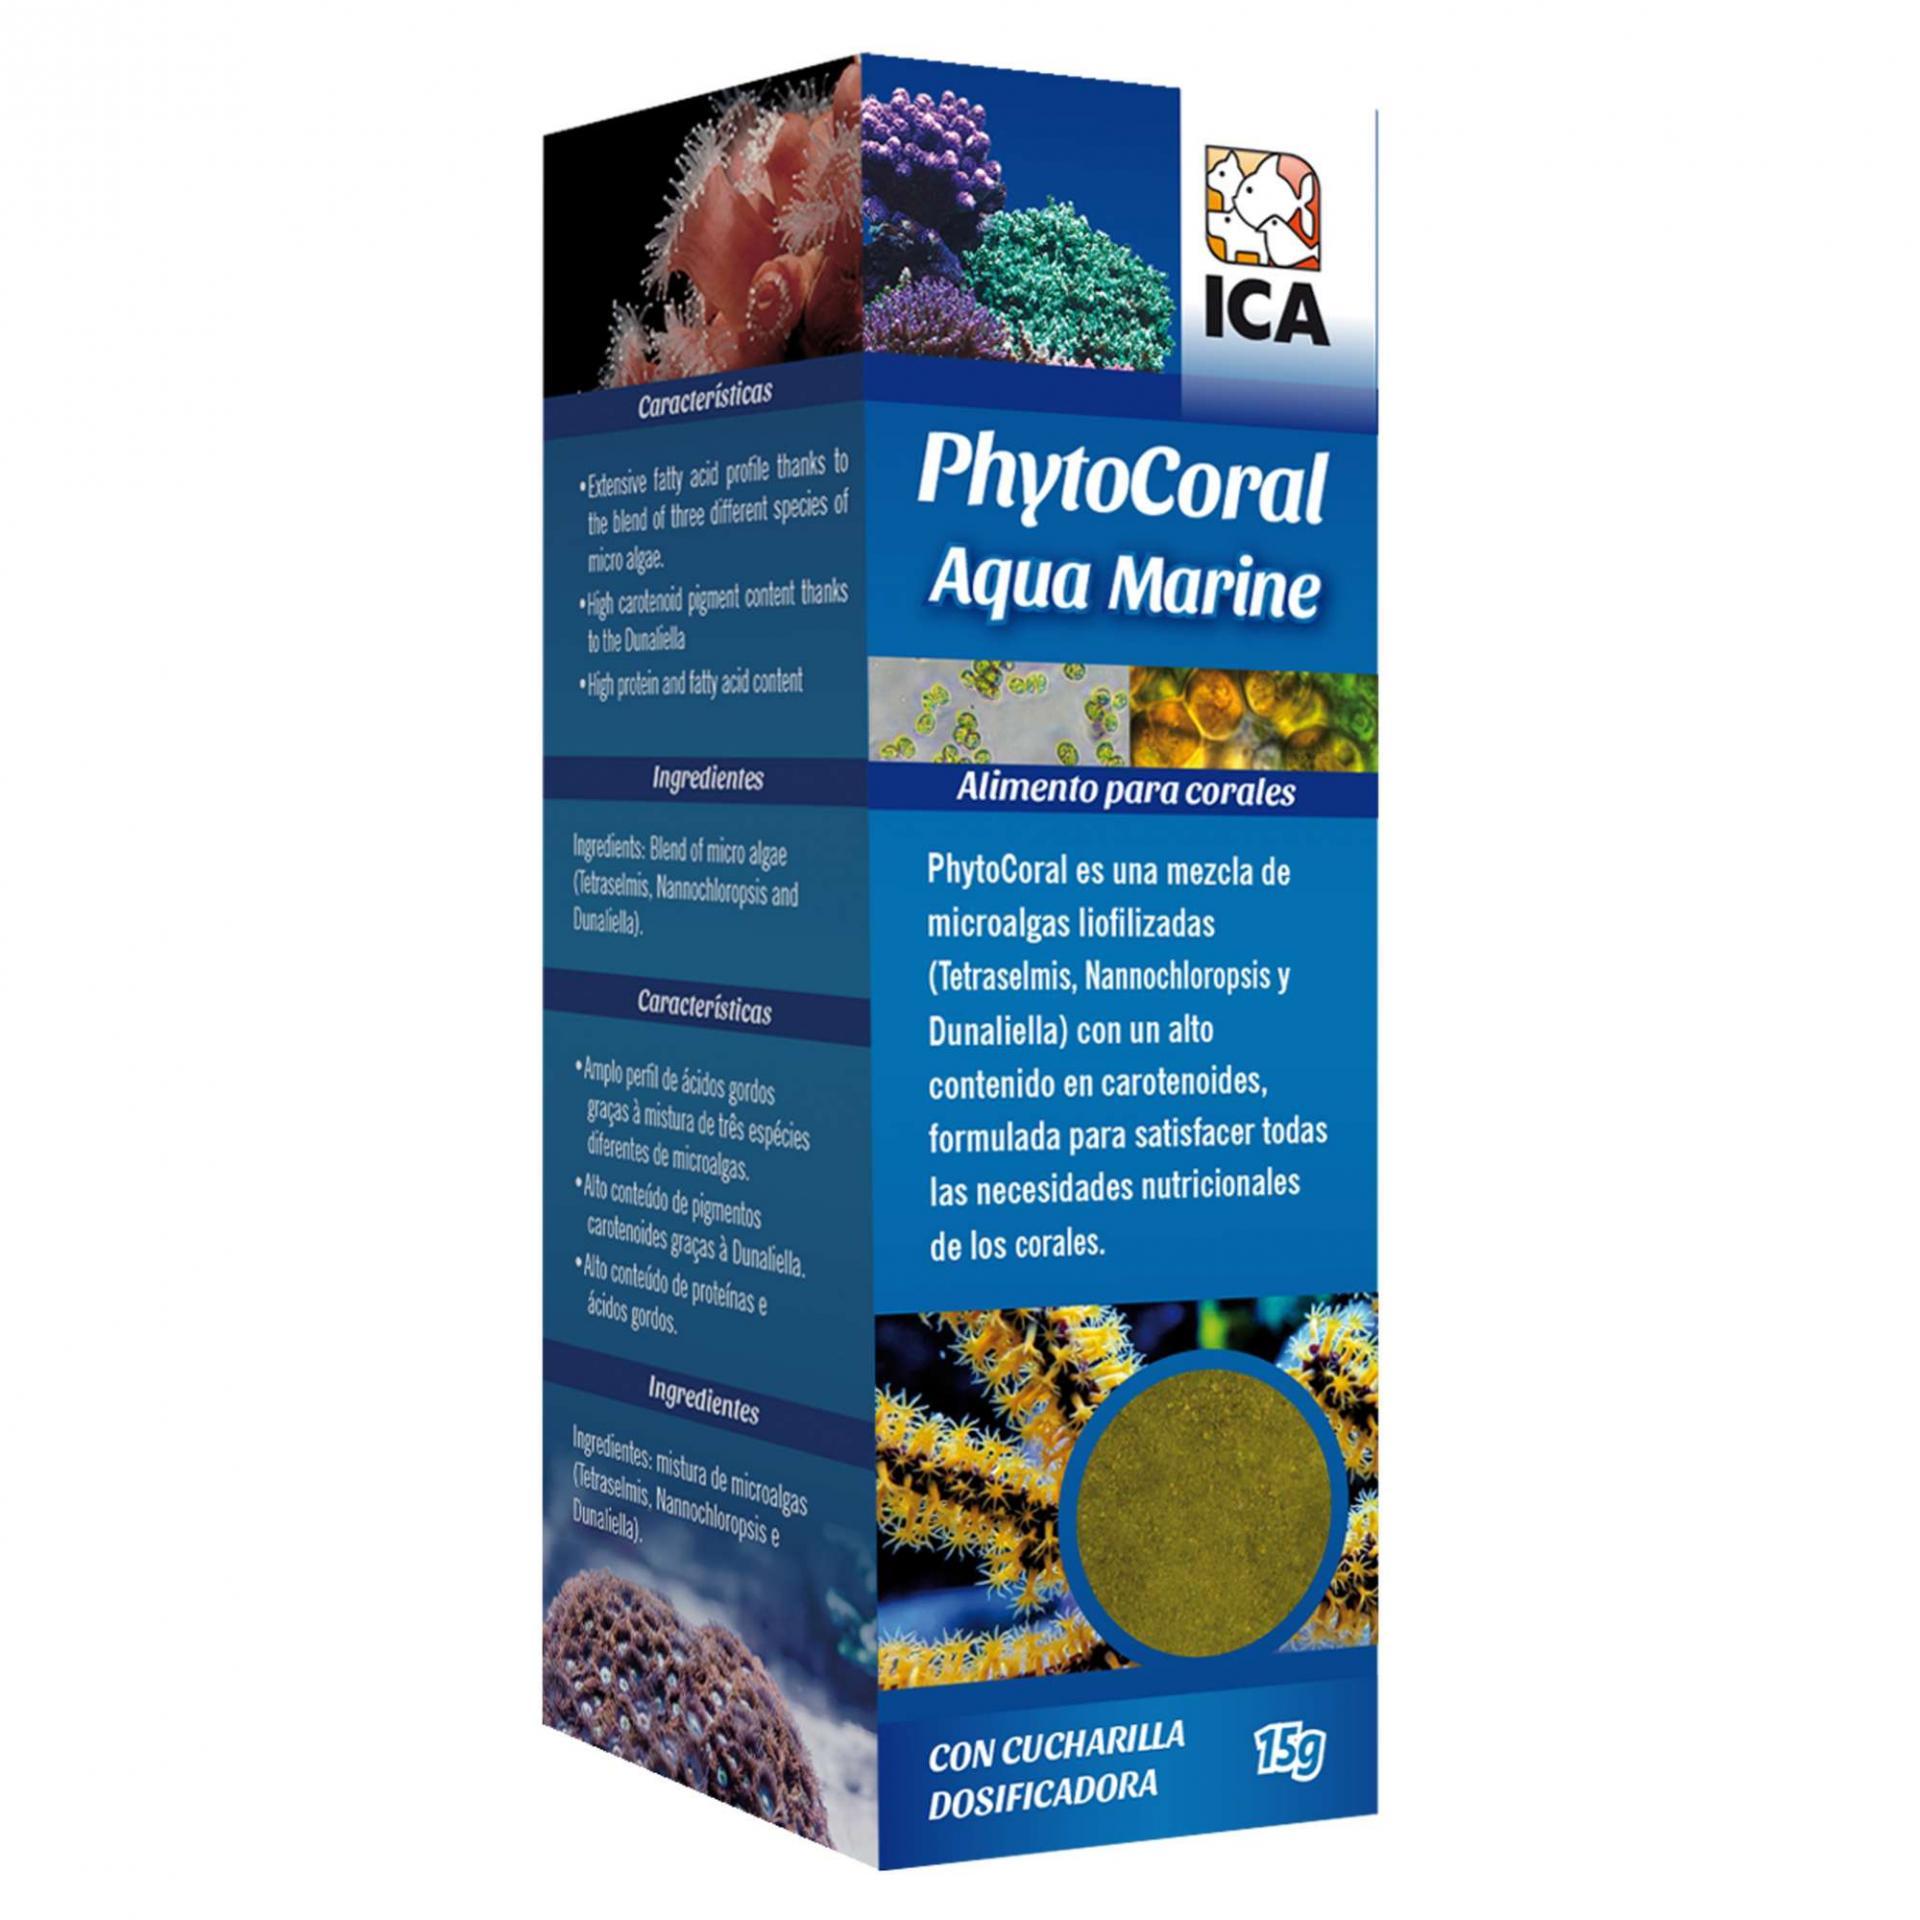 Pyto Coral Aqua Marine 15g